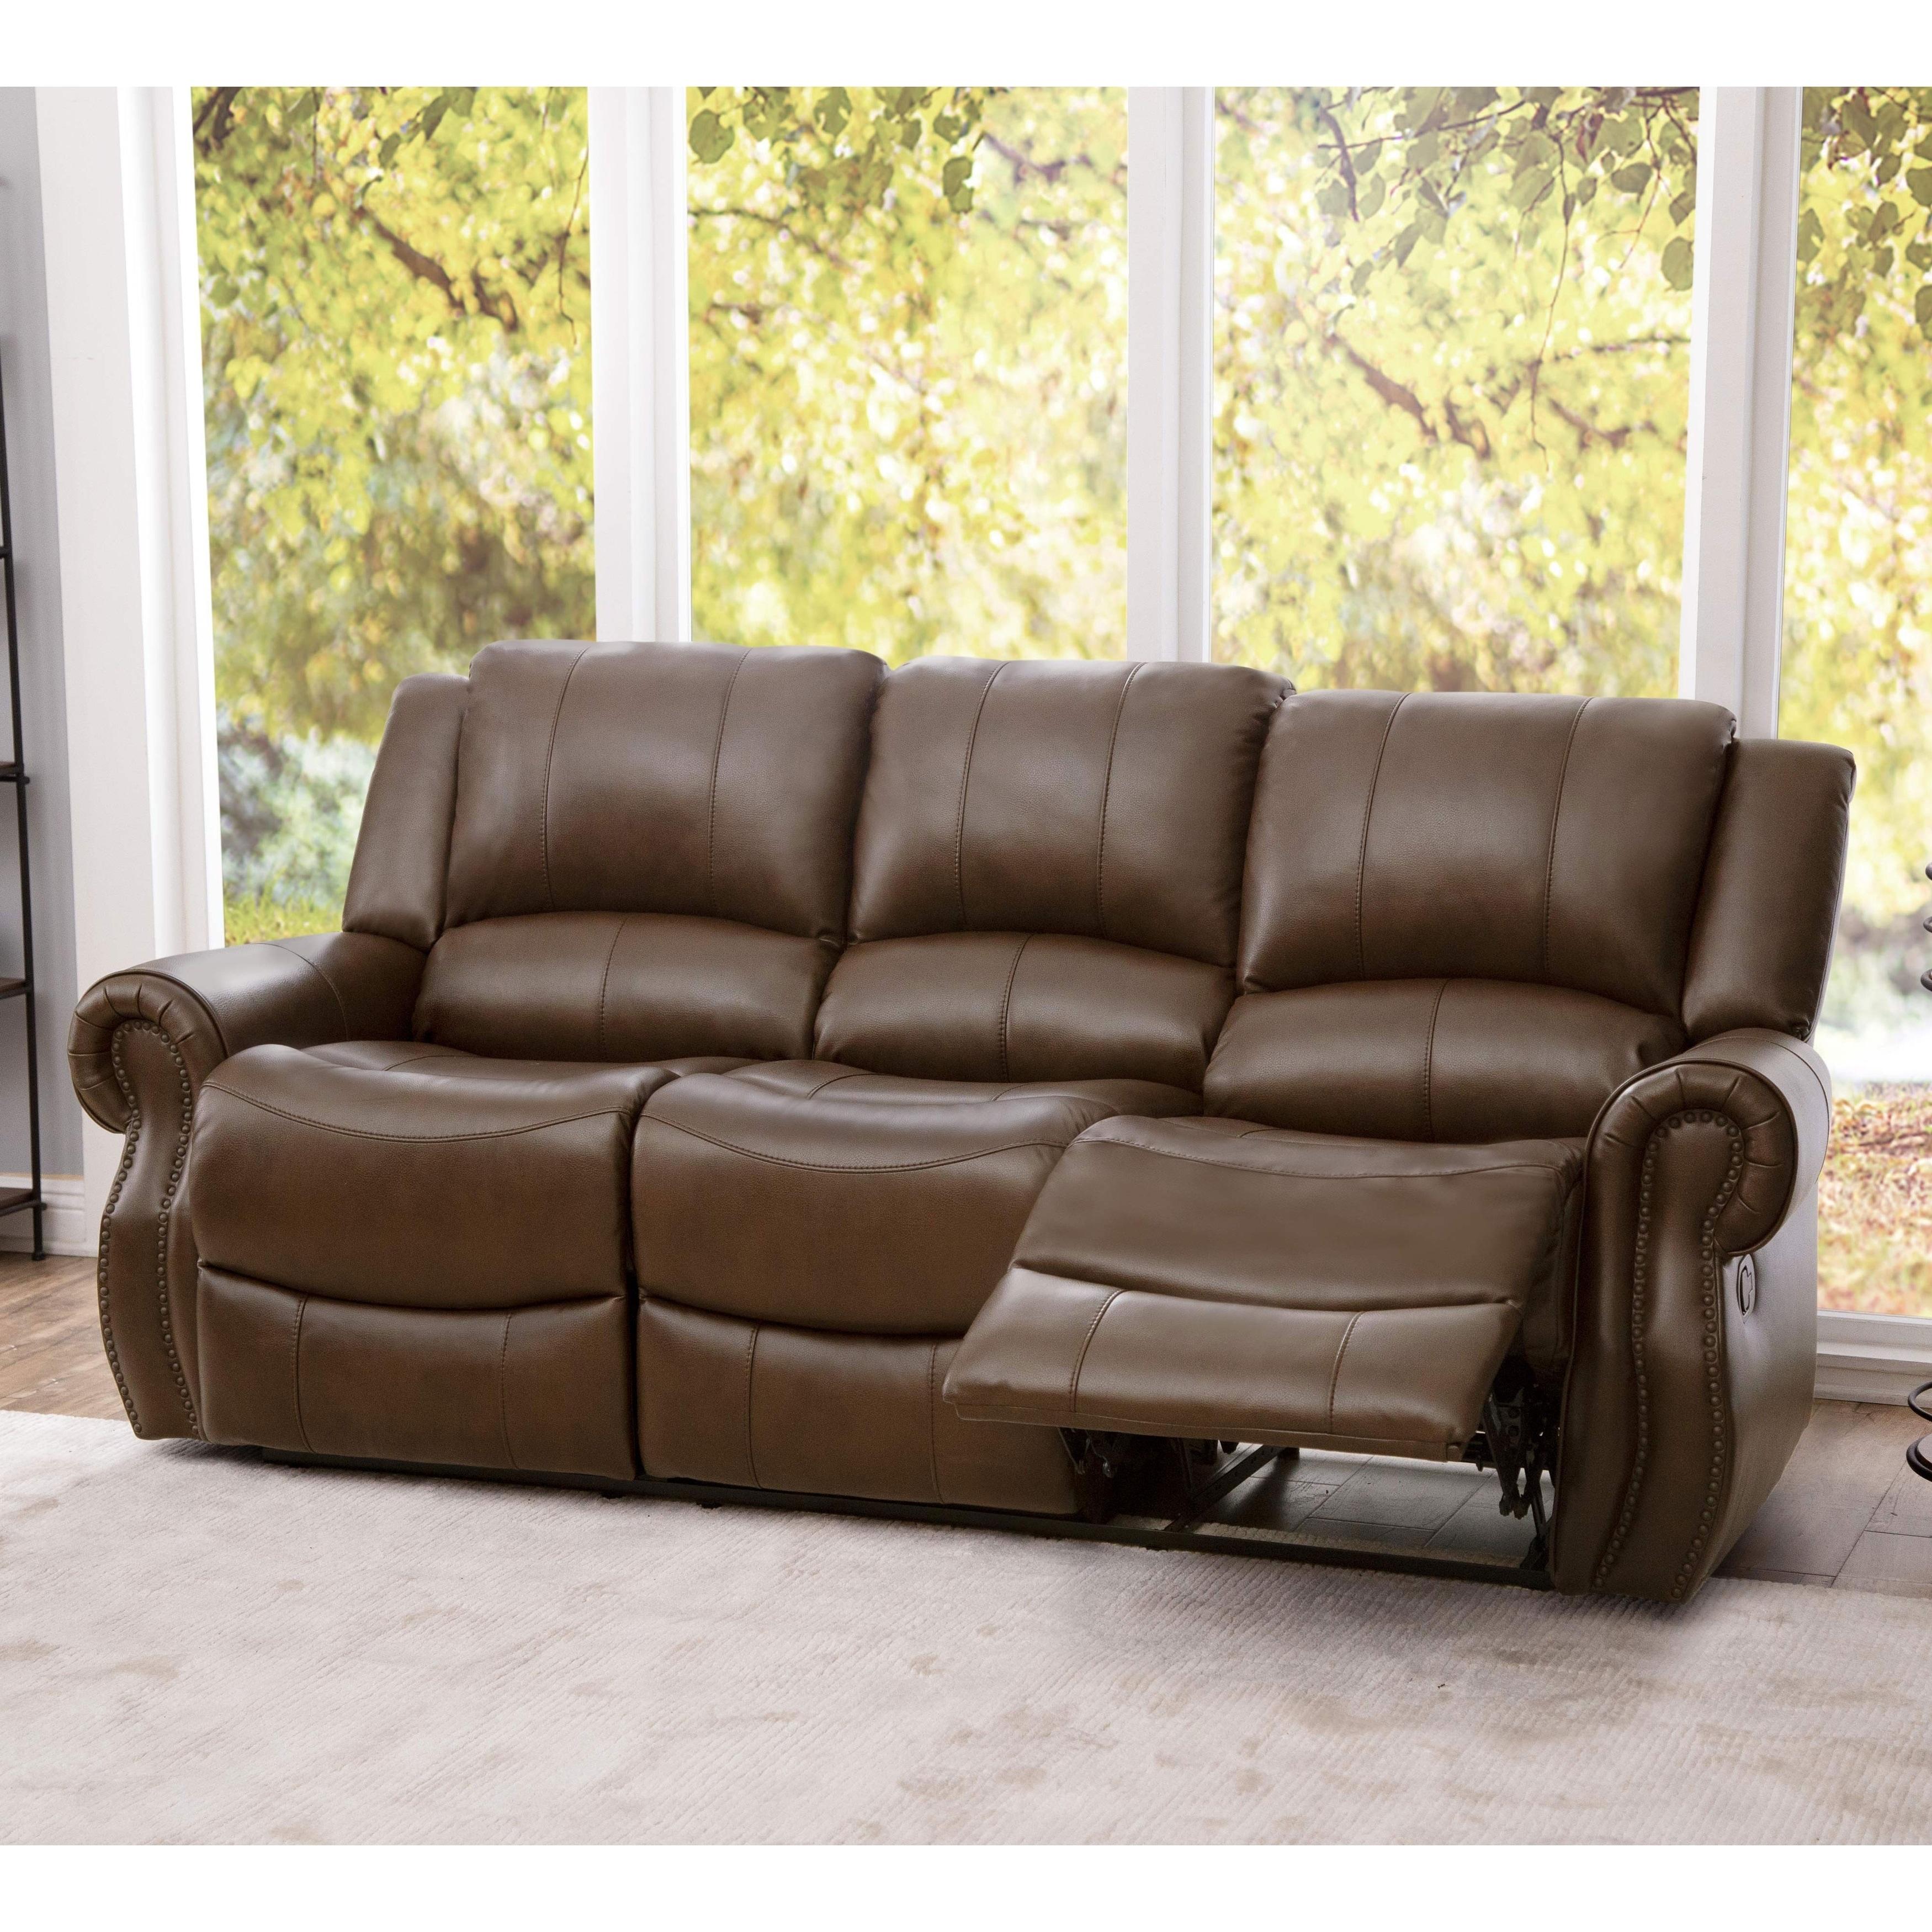 Abbyson Calabasas Mesa Brown Leather Reclining Sofa